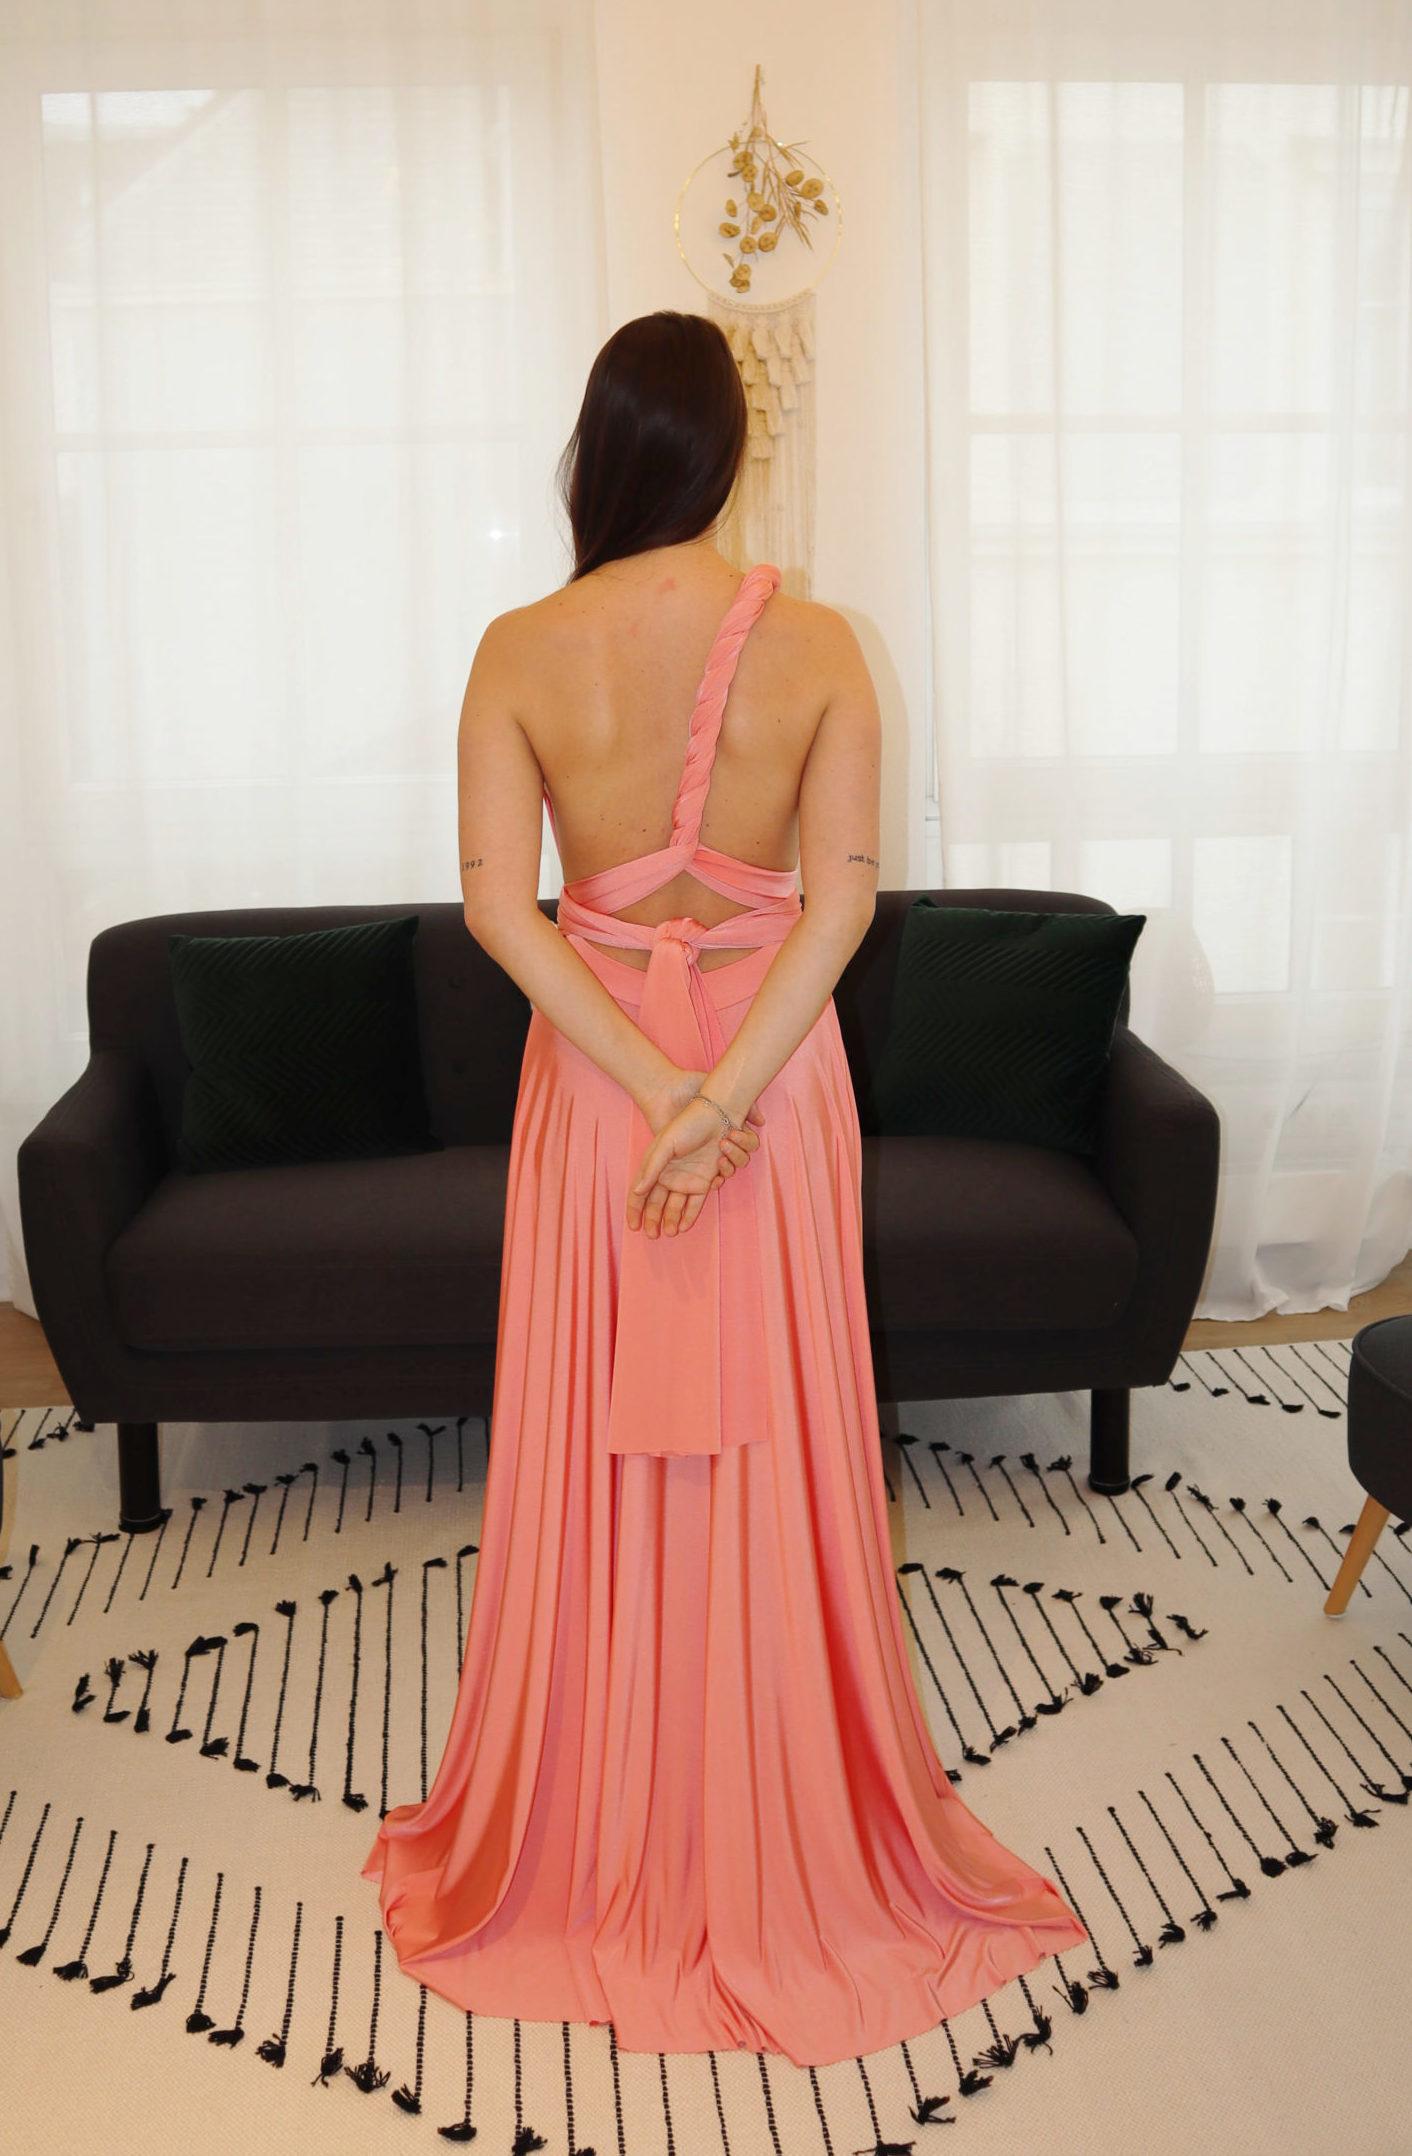 brautatelier ried-brautjungfernkleider-bridesmaids-two birds ny-long dress-coral-ruecken-1